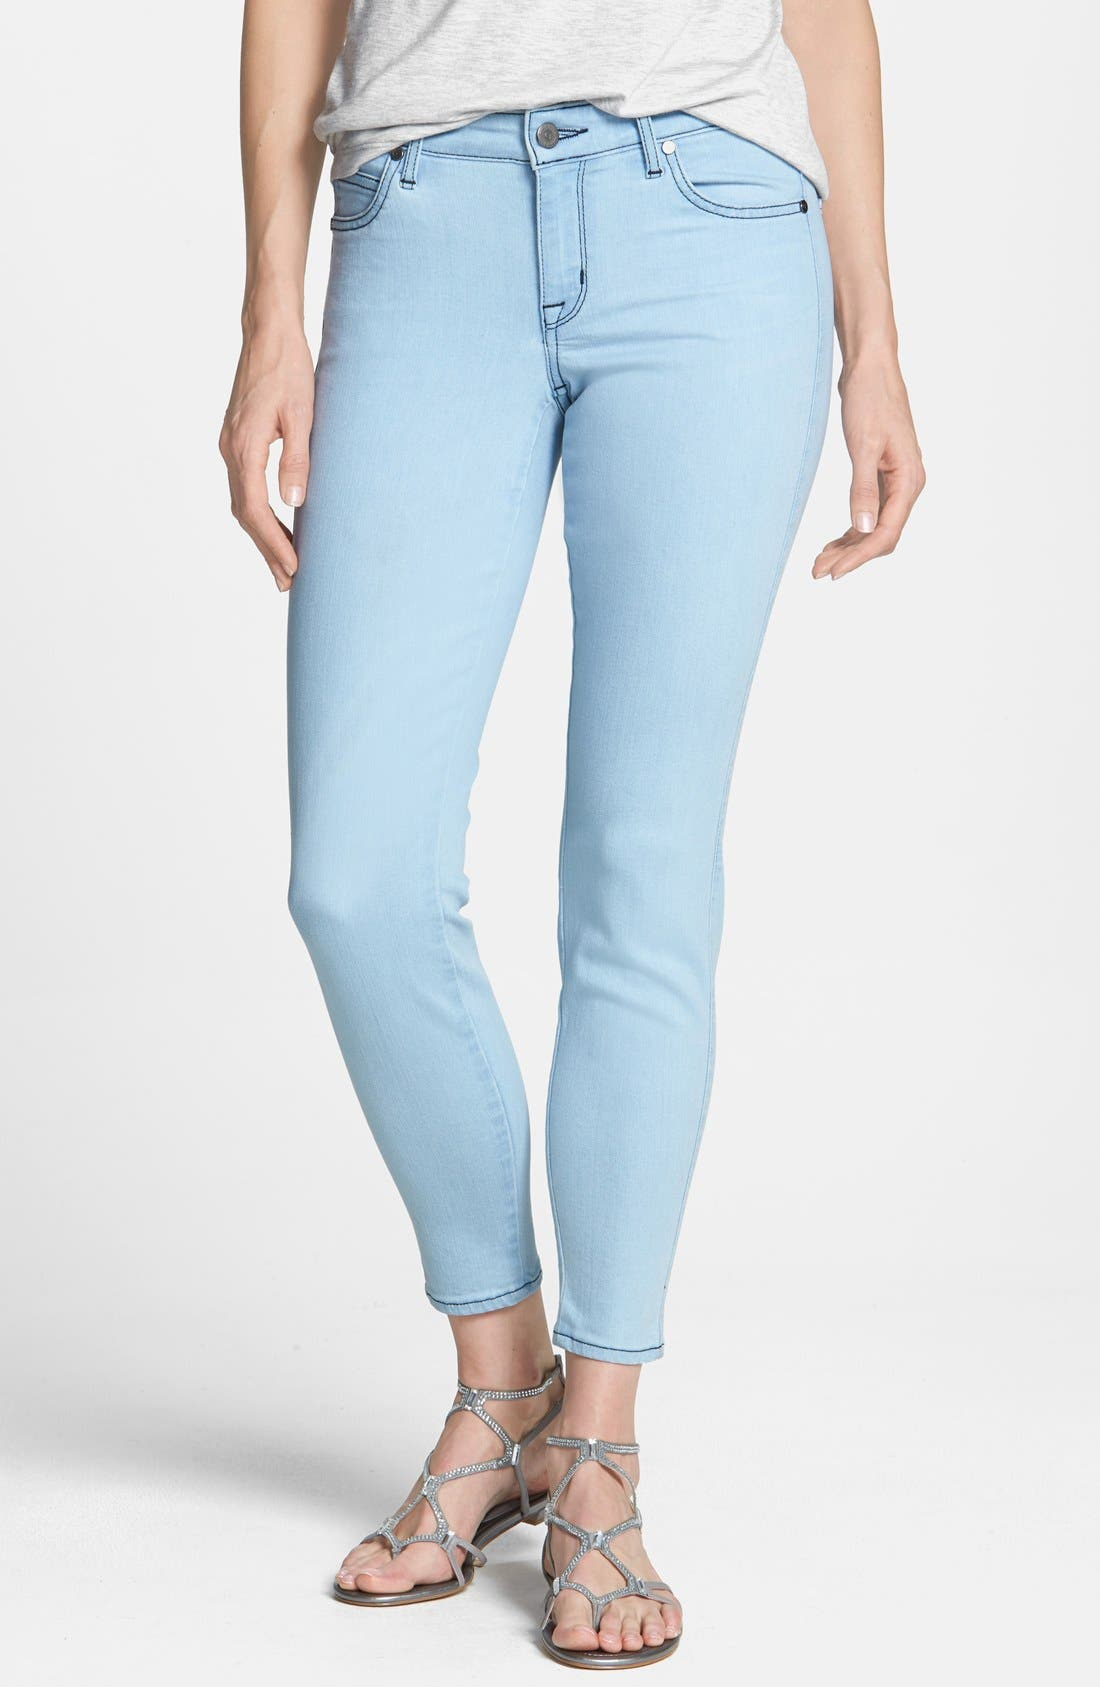 Alternate Image 1 Selected - CJ by Cookie Johnson 'Wisdom' Stretch Ankle Skinny Jeans (Sawyer)